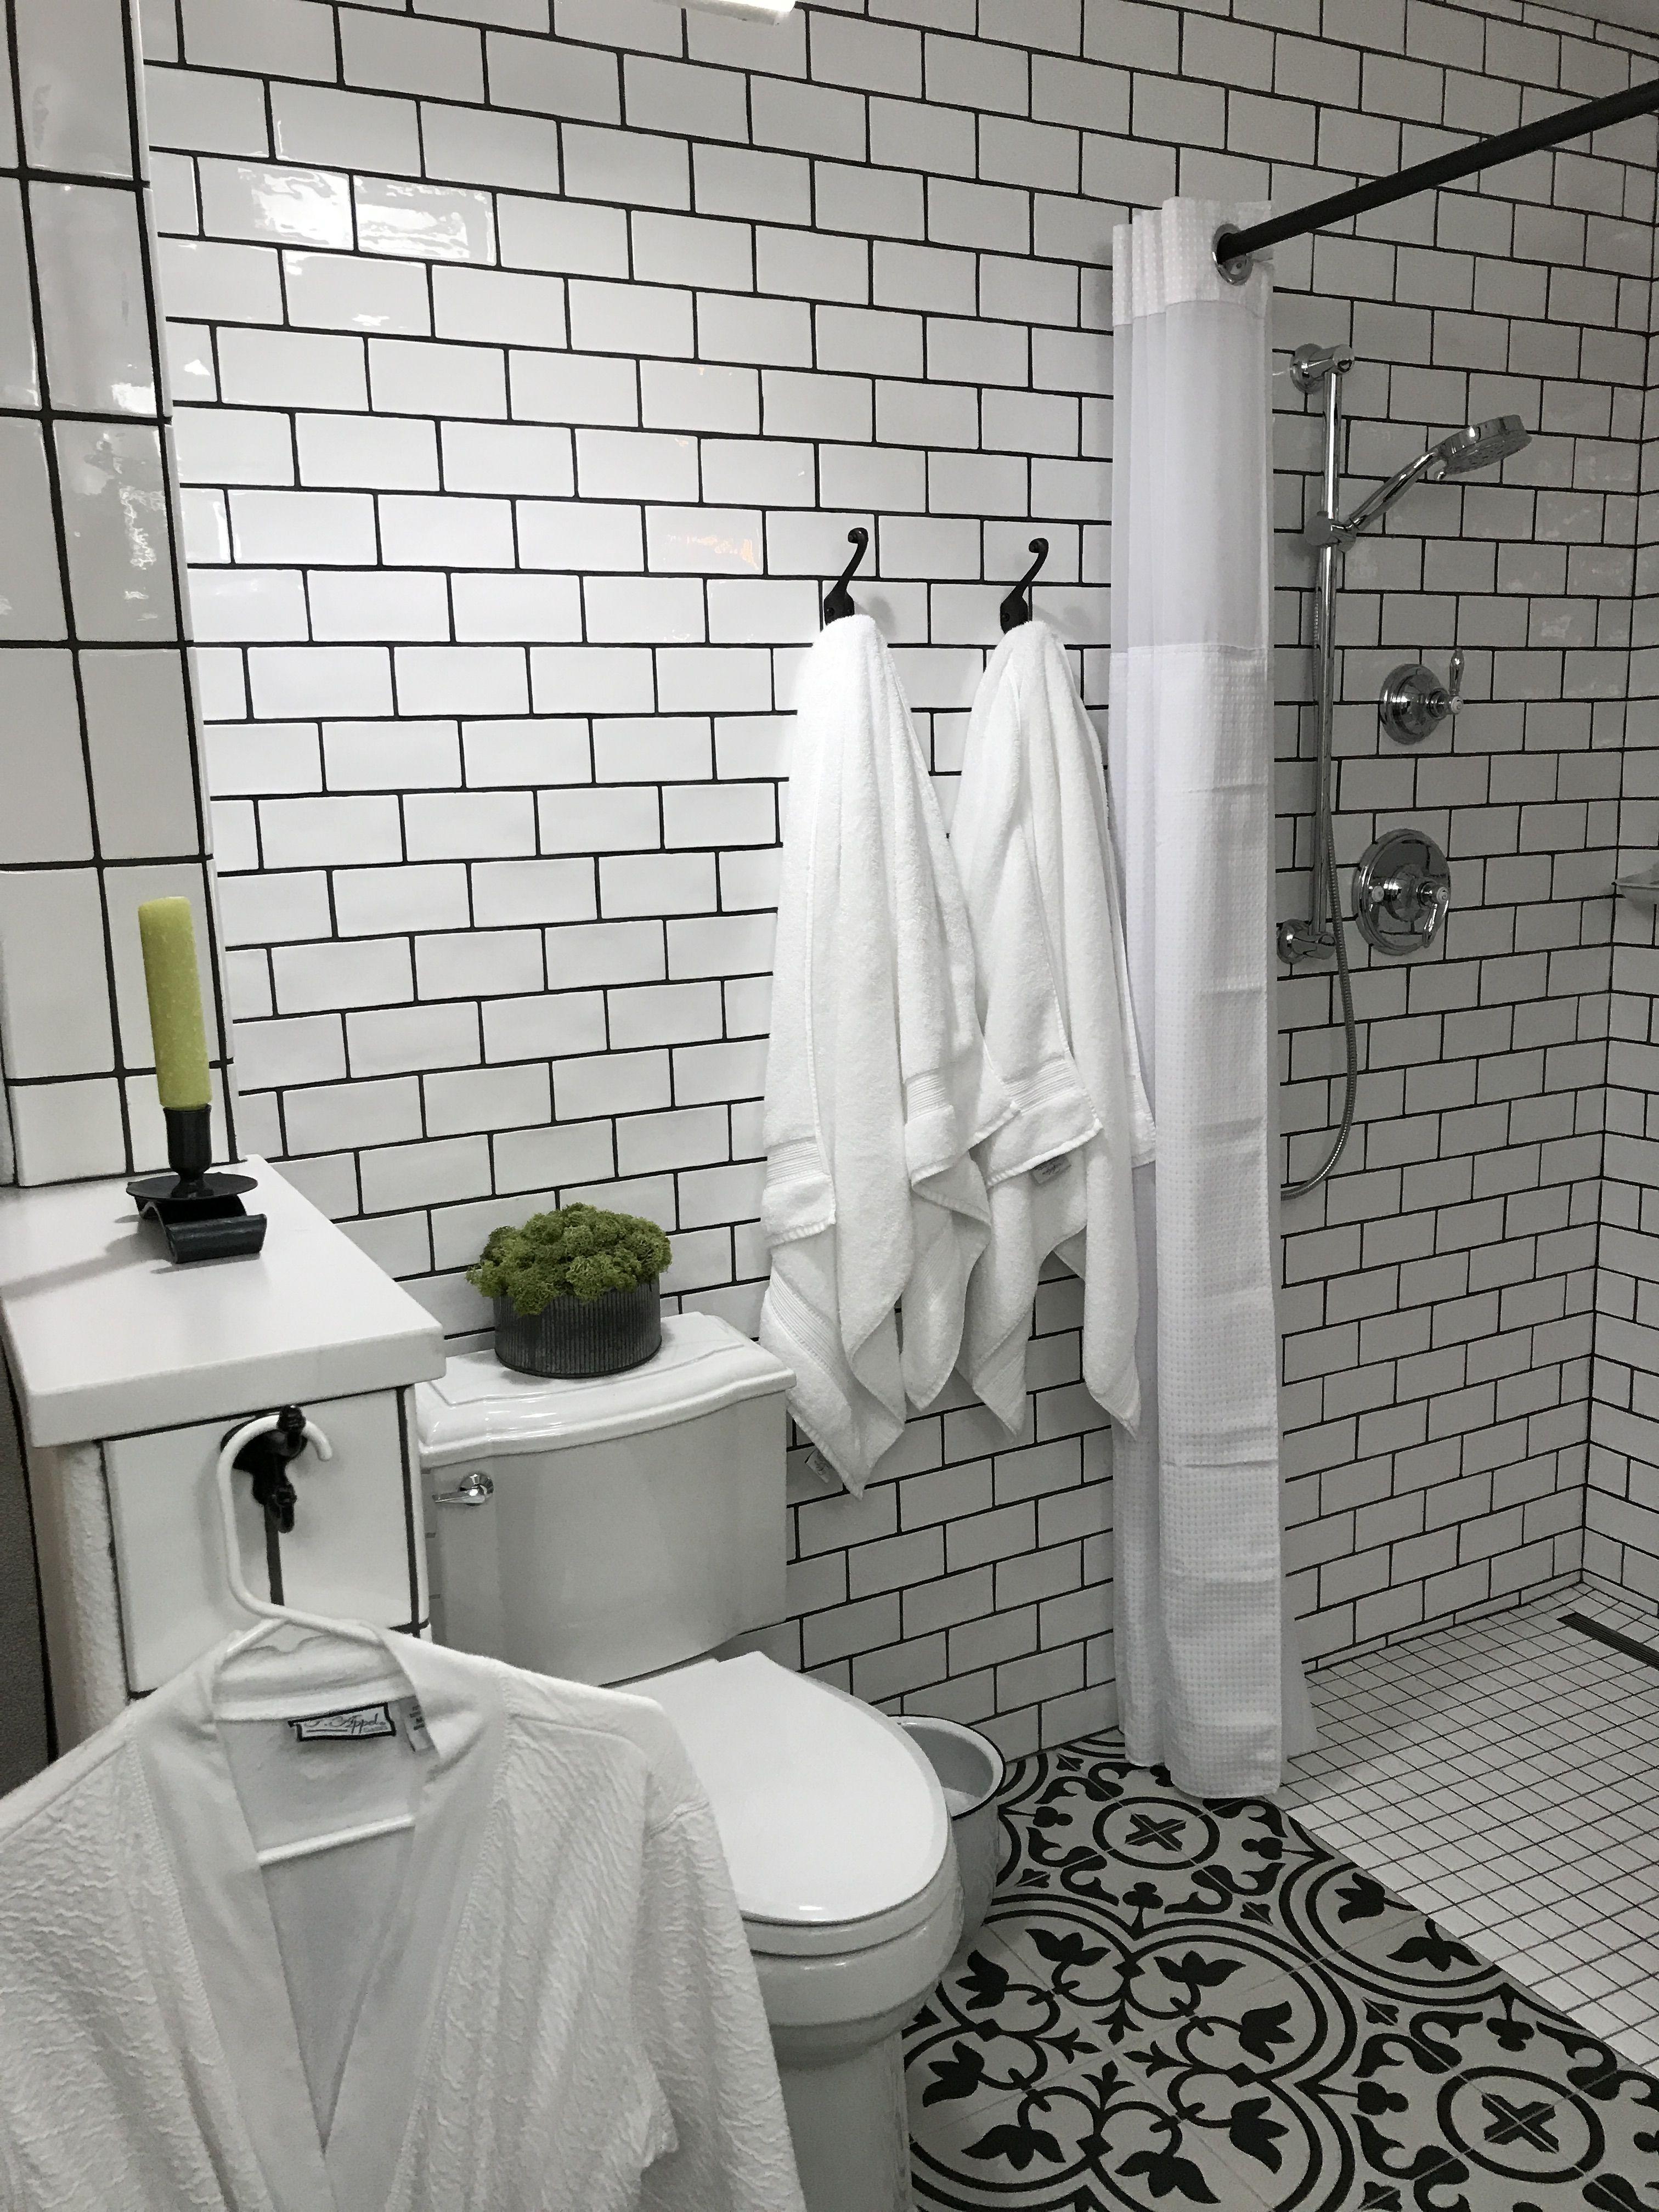 Towel Hooks Top Bathroom Design Master Bathroom Design Bathroom Remodel Master